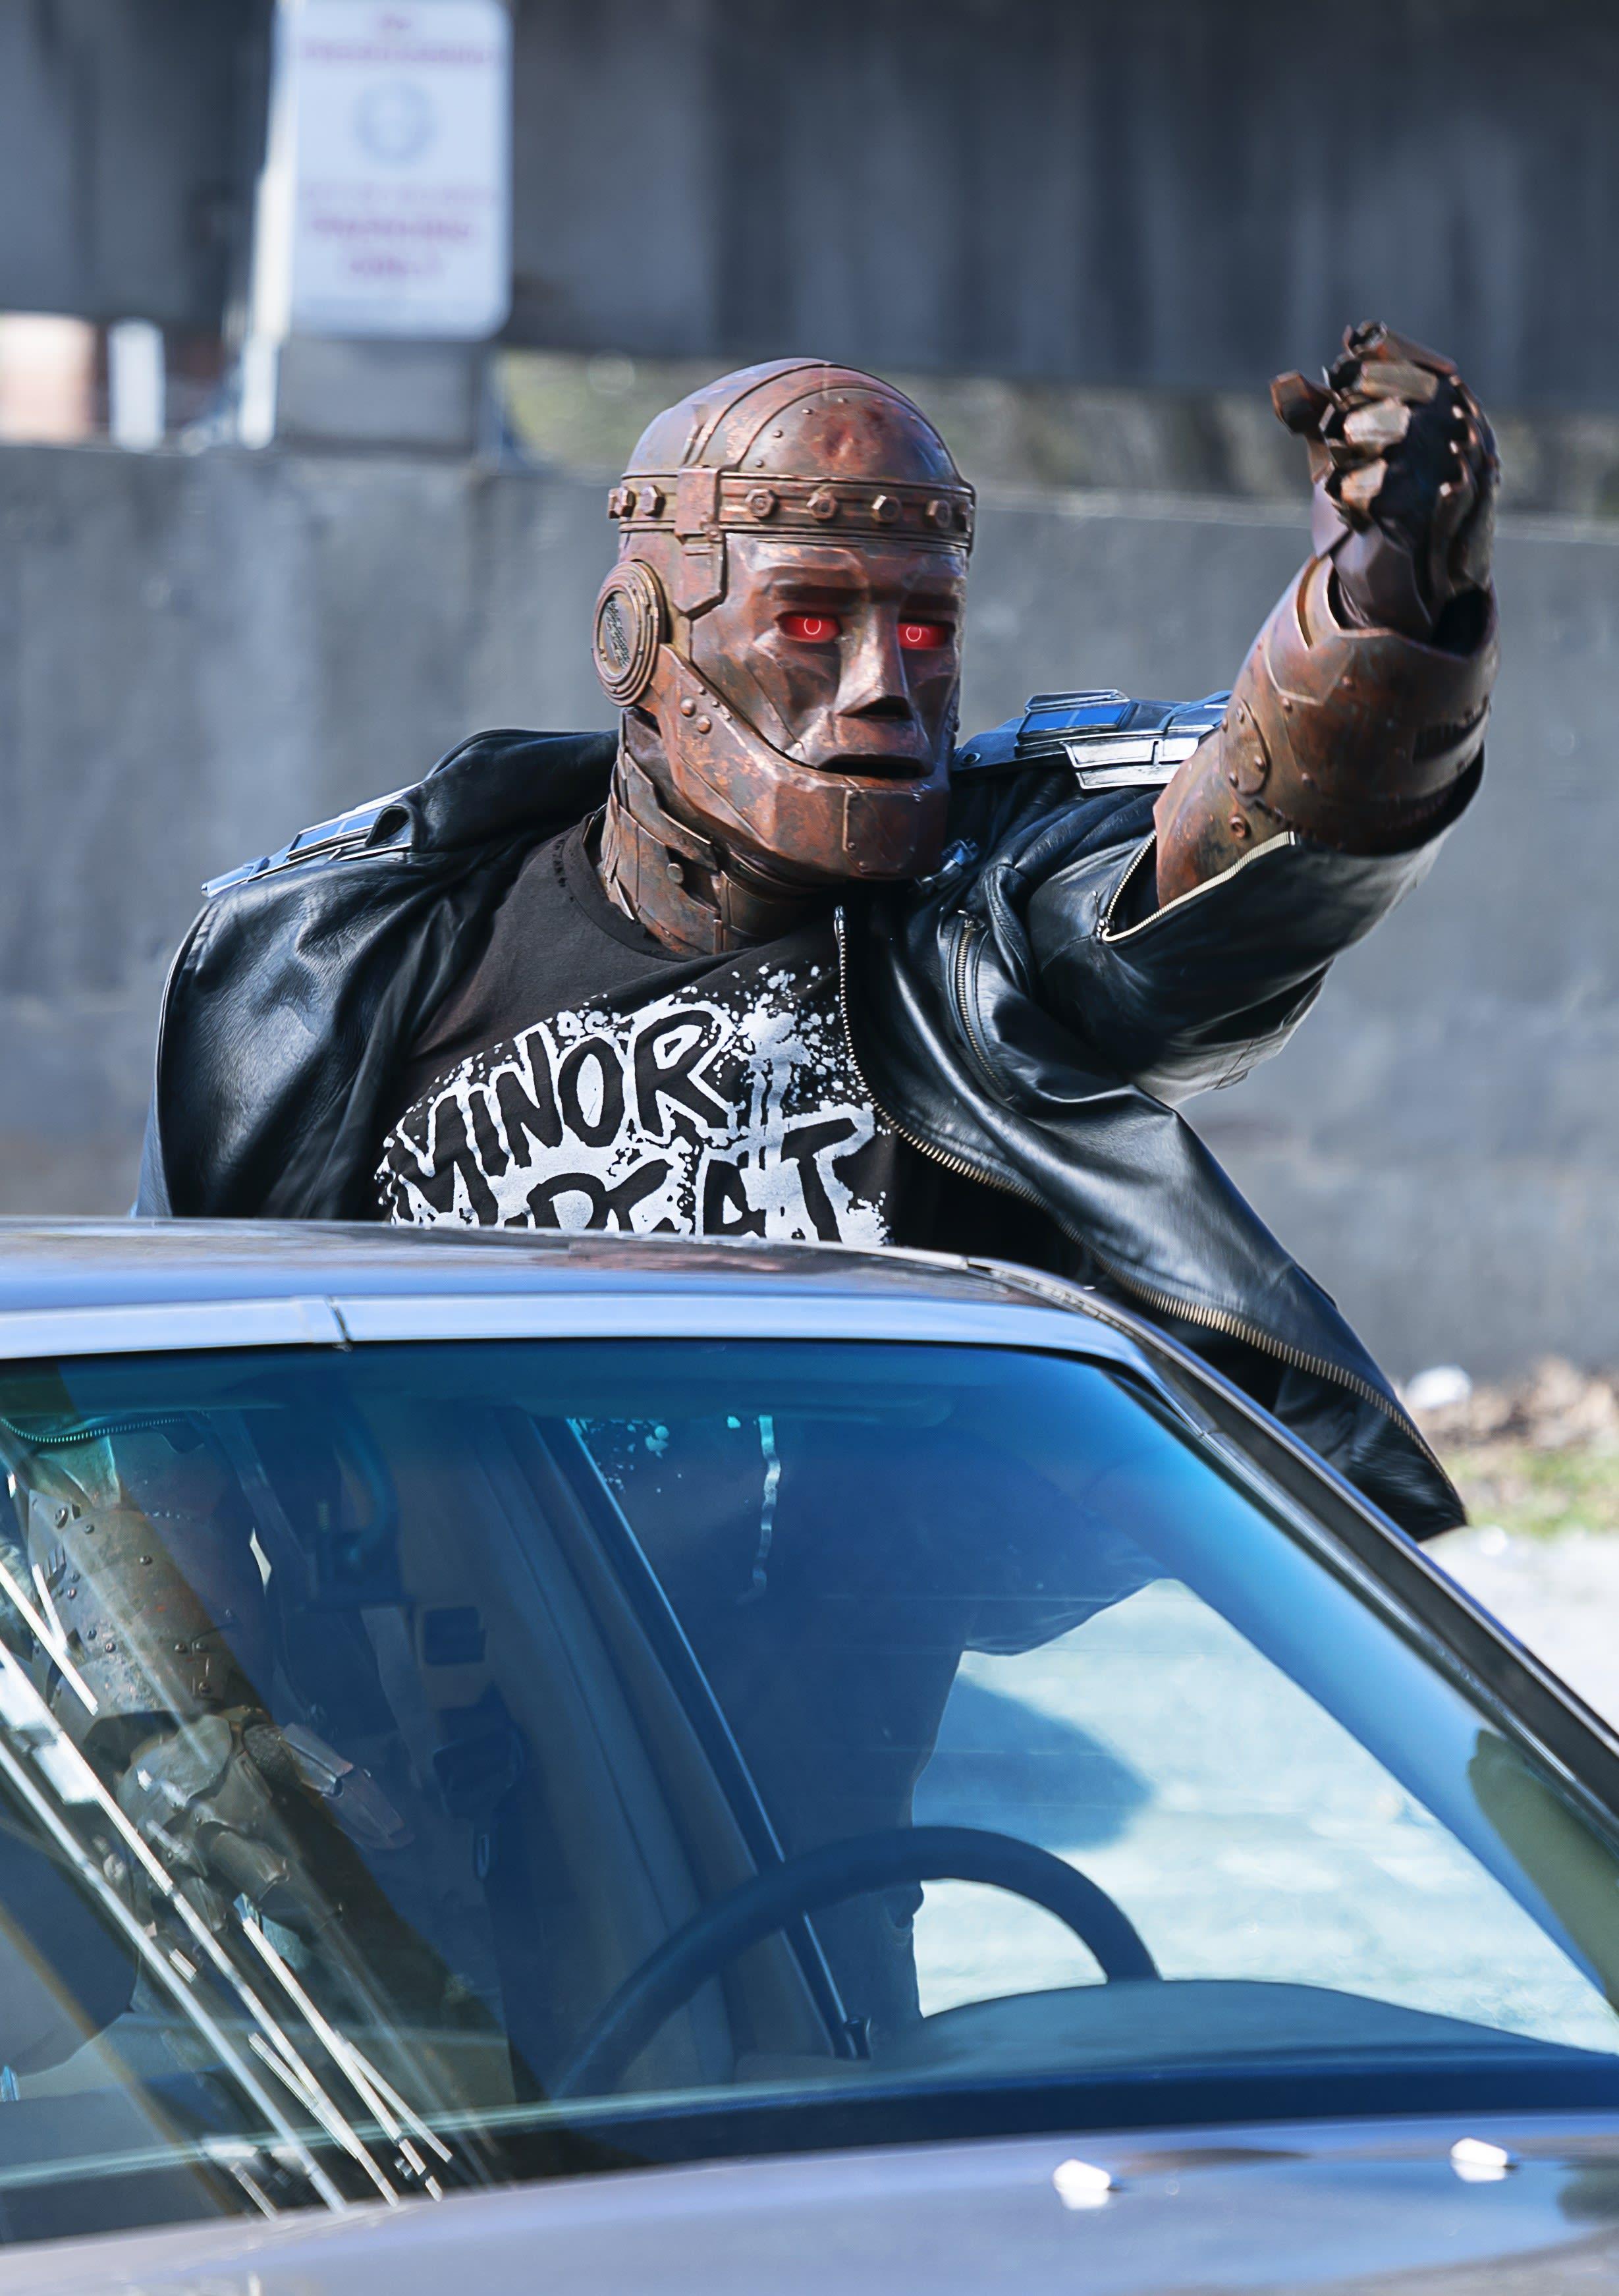 Steele Fist Doom Patrol Season 2 Episode 5 Tv Fanatic